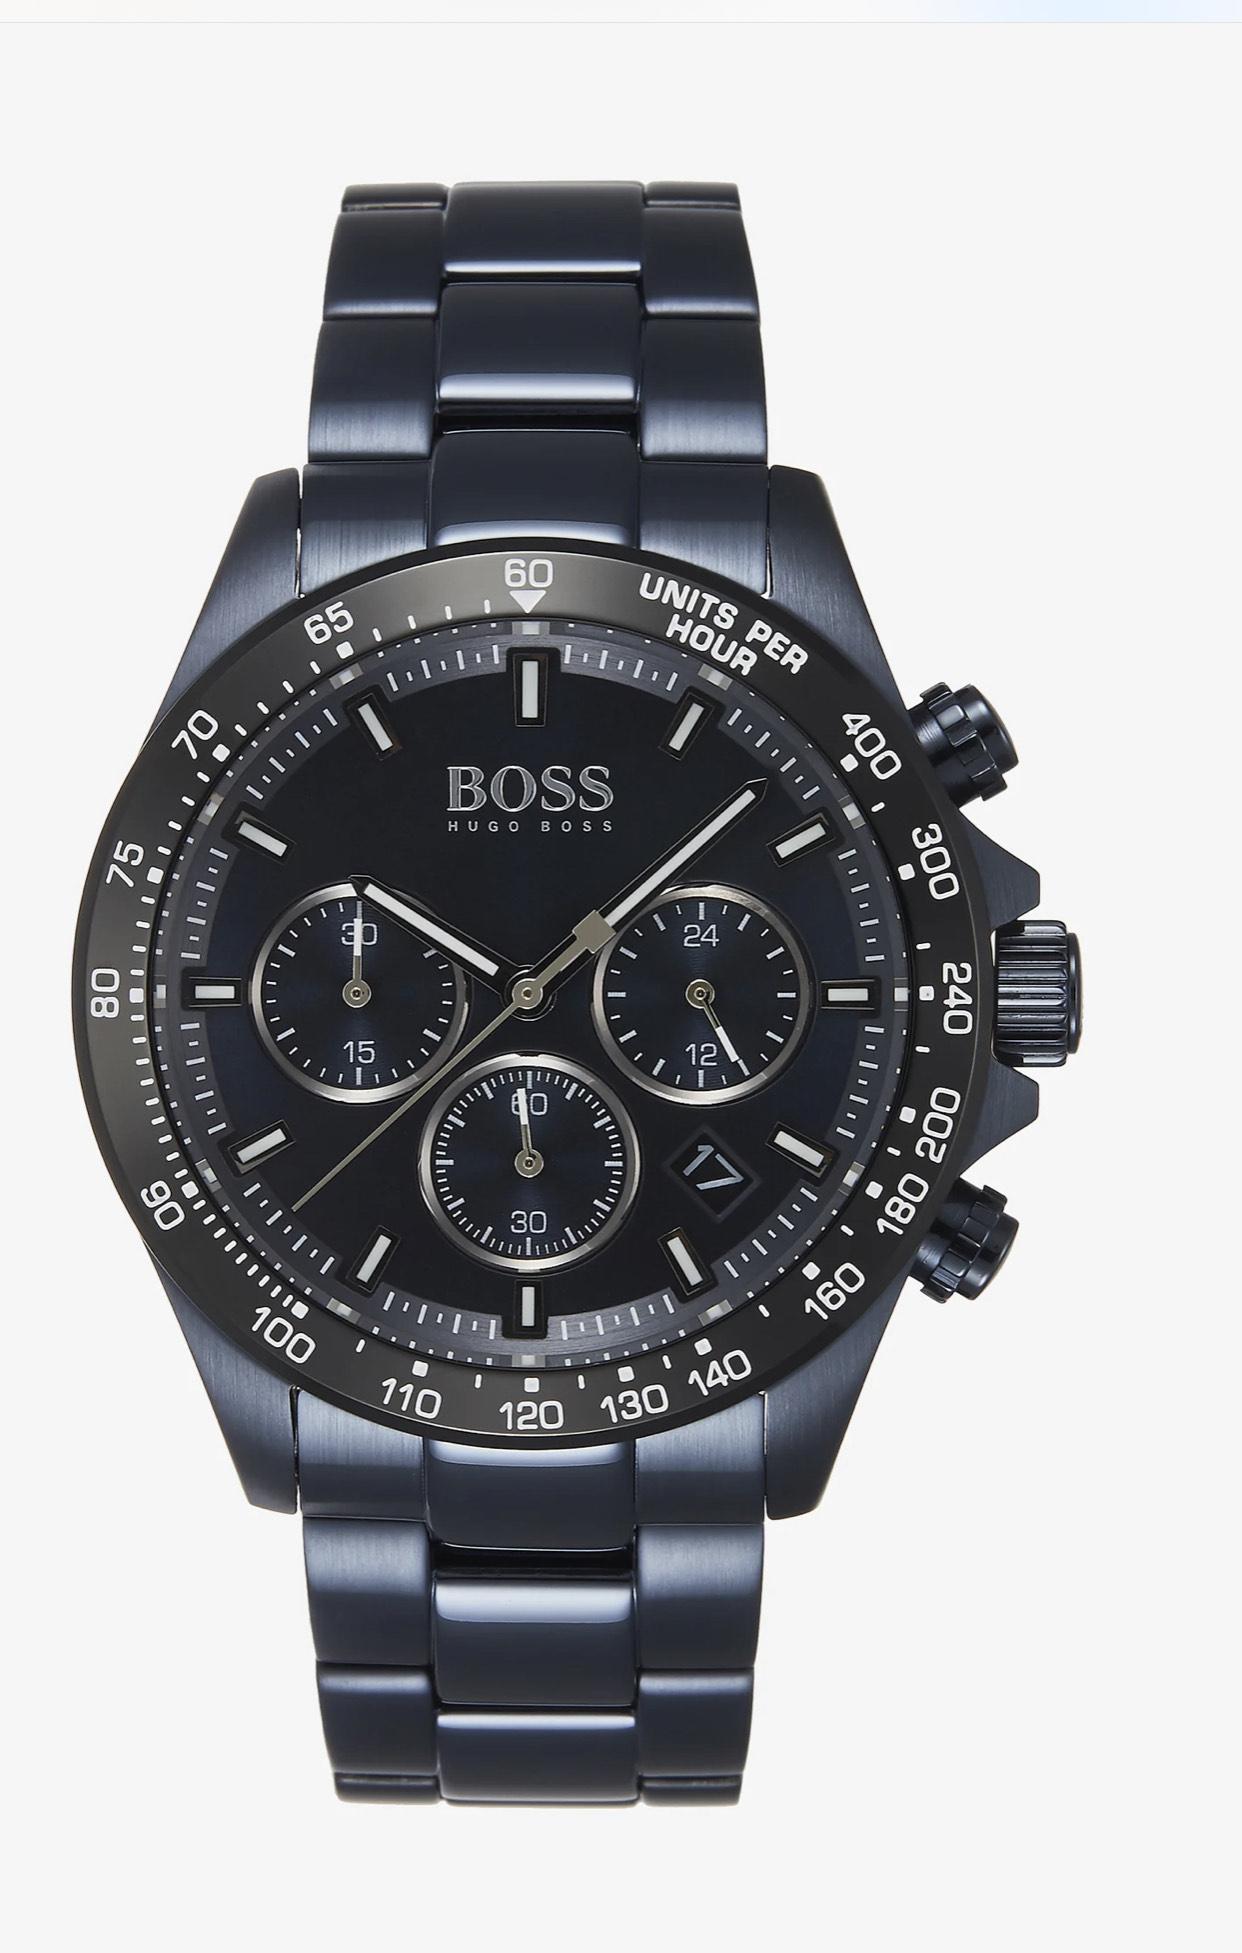 (Zalando) Hugo Boss horloge